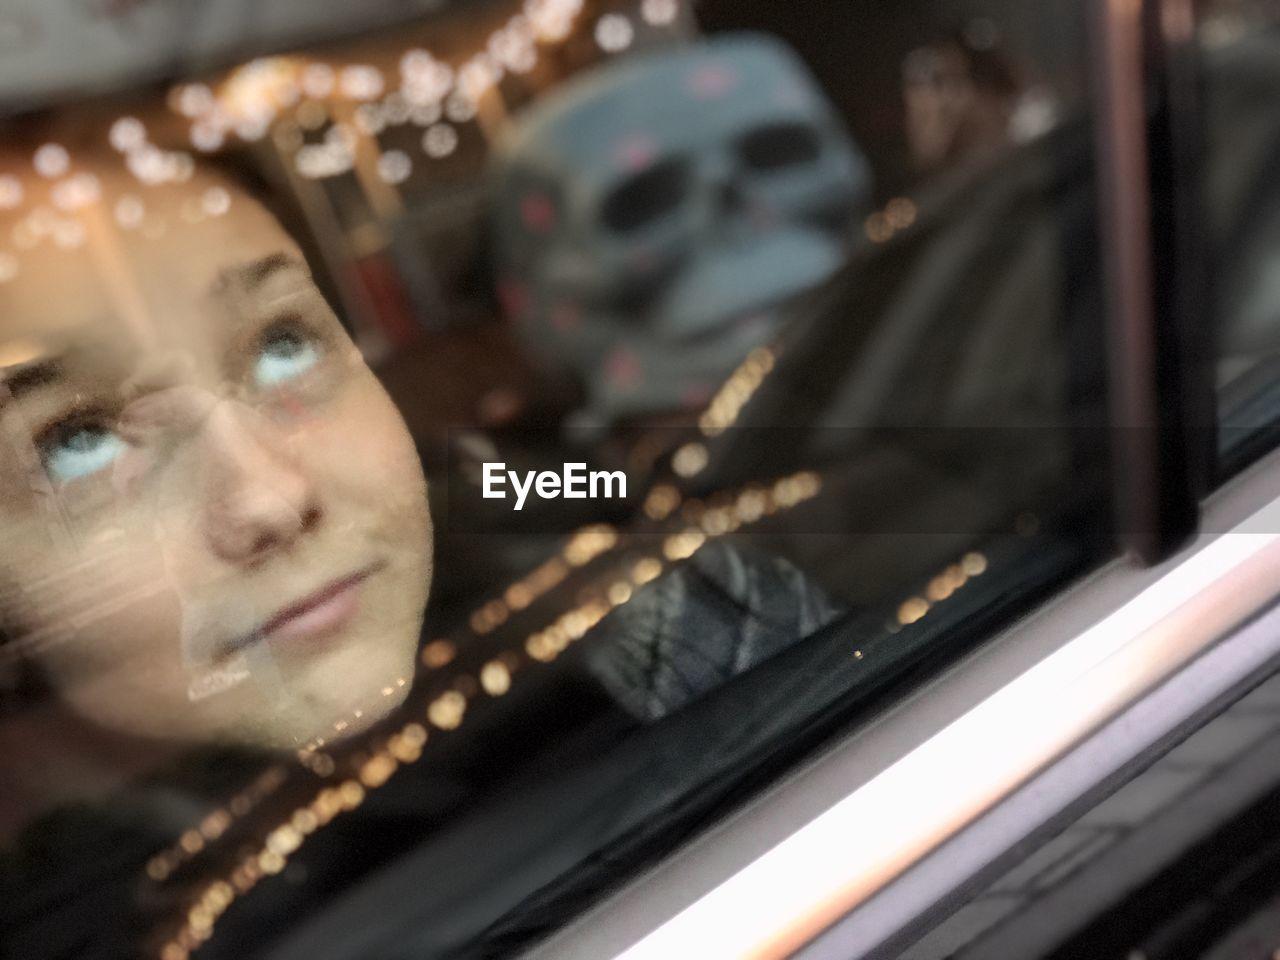 CLOSE-UP PORTRAIT OF MAN SEEN THROUGH CAR WINDOW